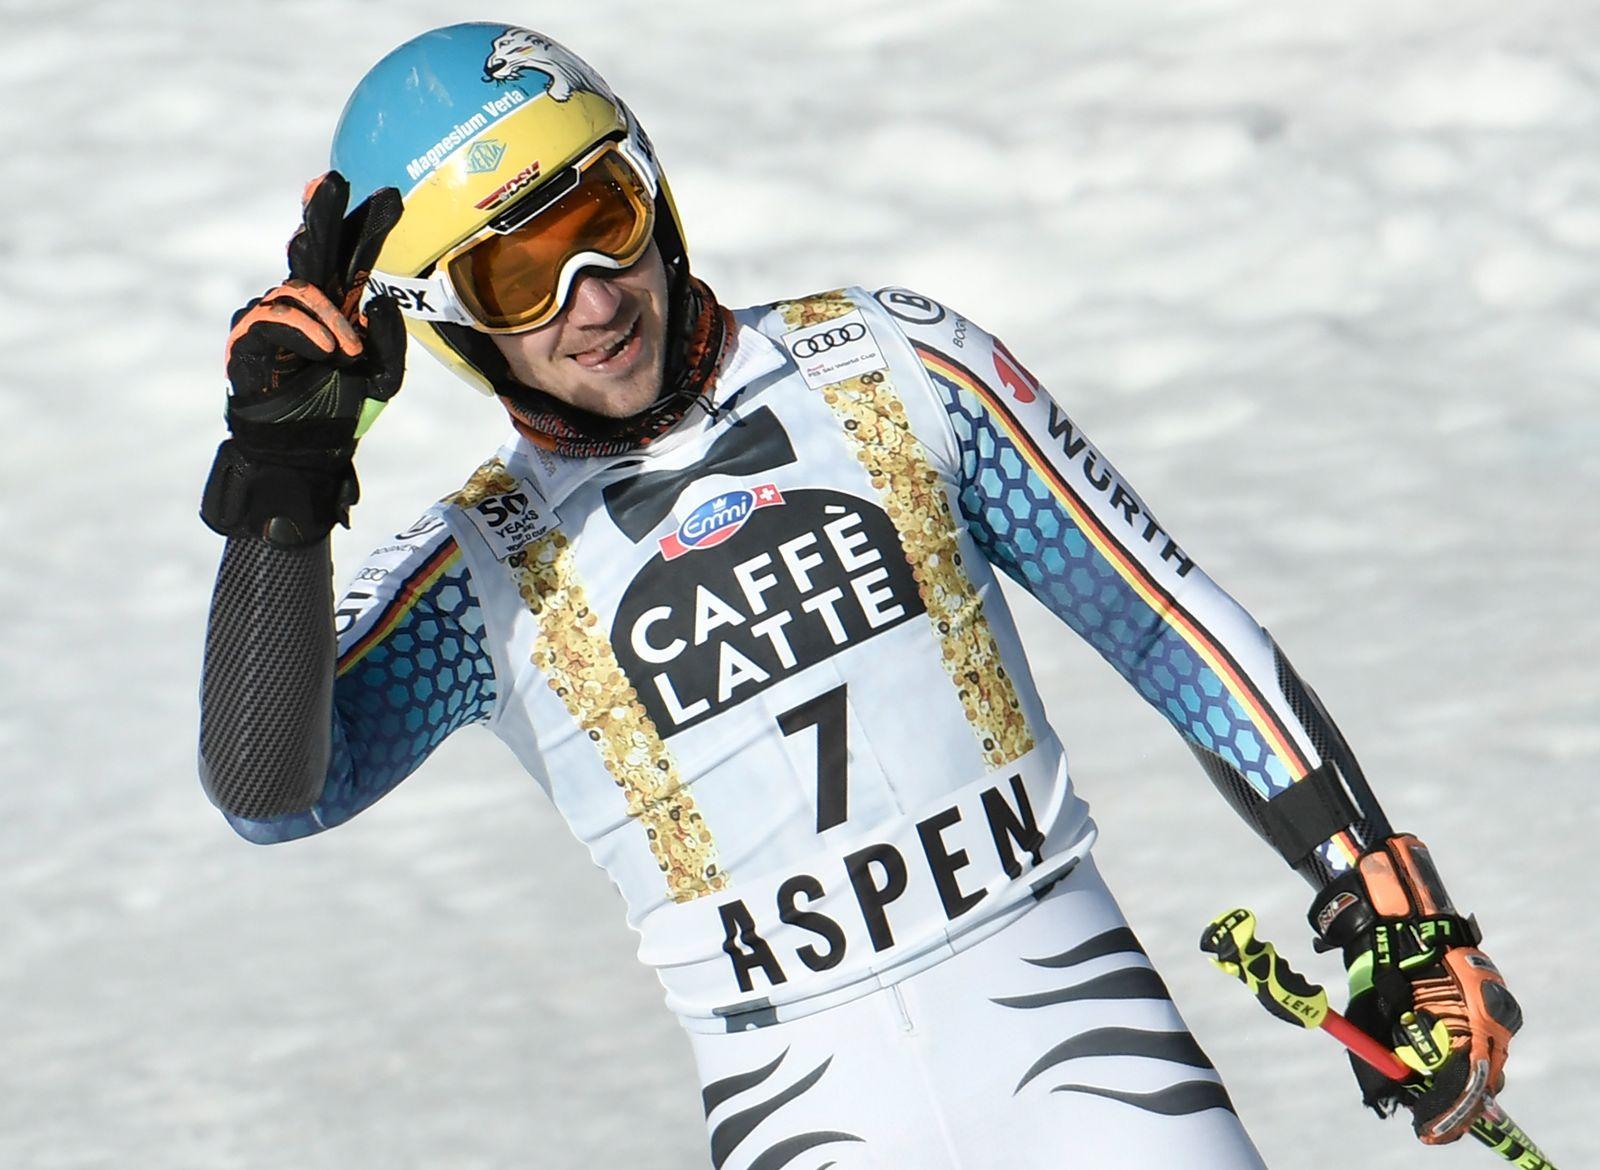 Ski alpin: Weltcup Riesenslalom Herren